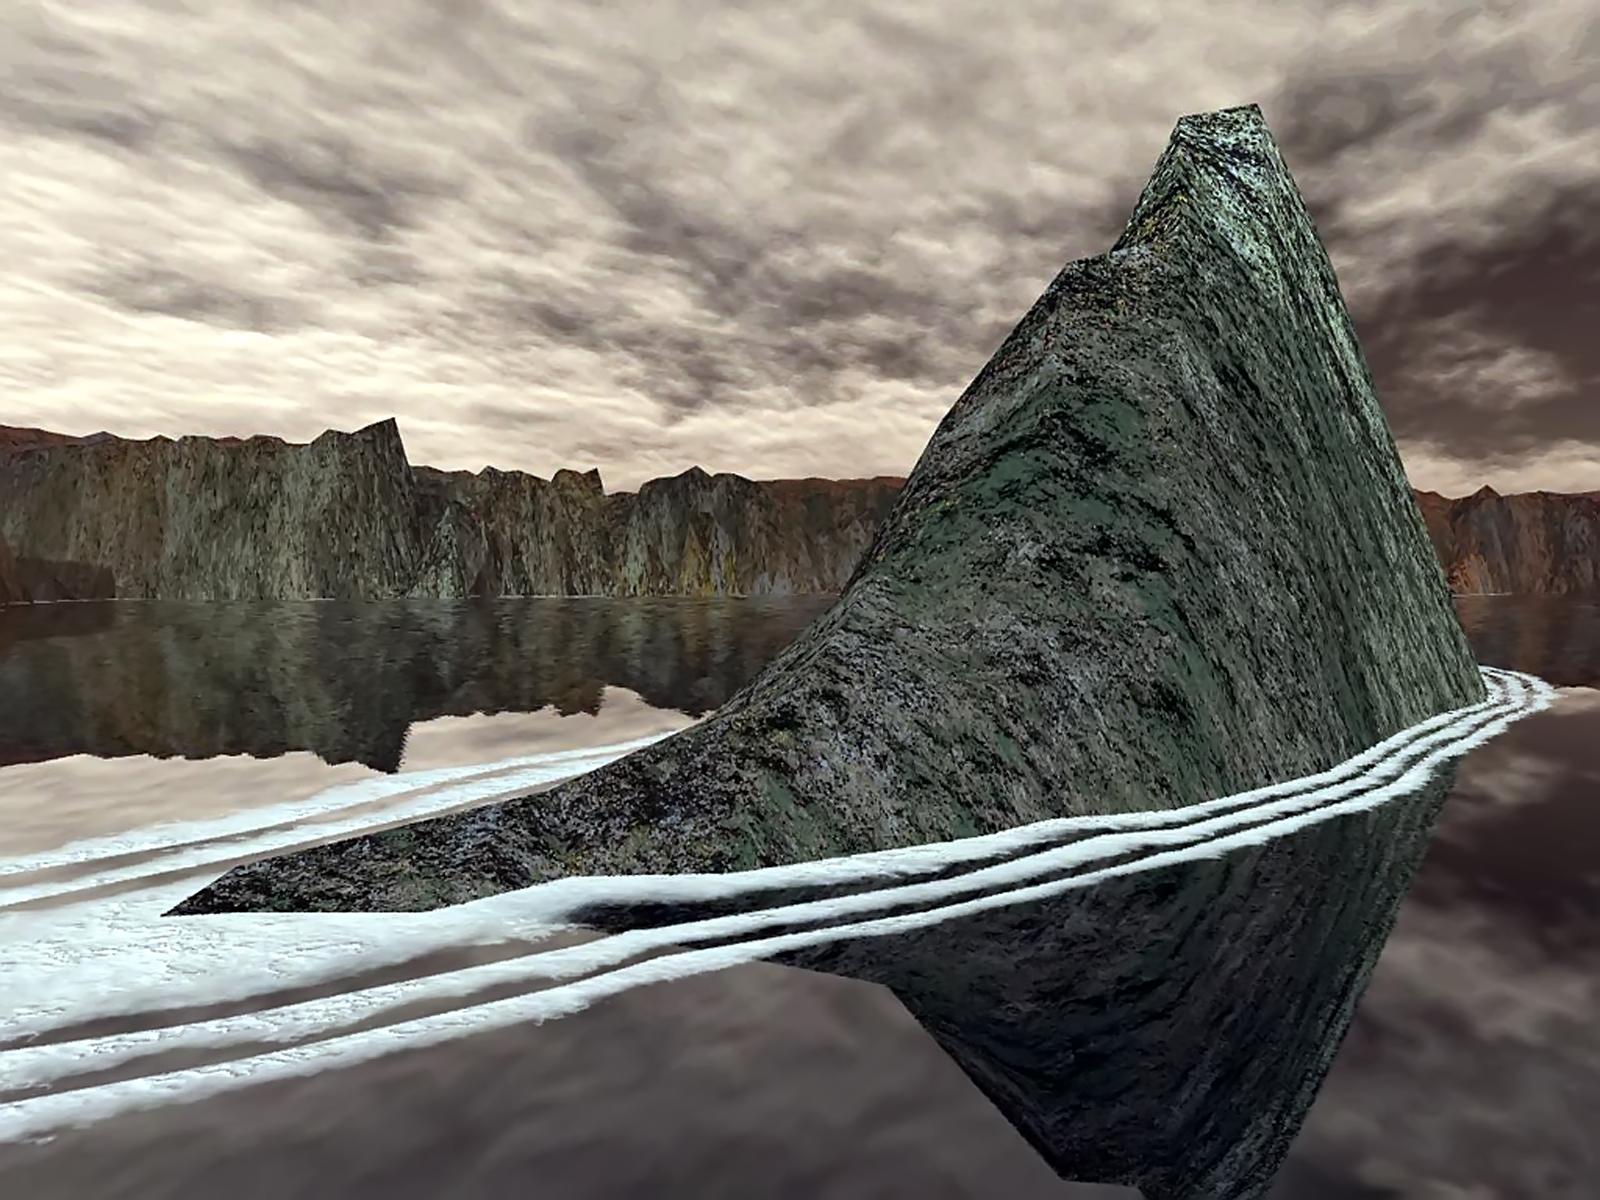 STONE SEAL, 3d, Bspo06, Landscape, Mountain, HQ Photo